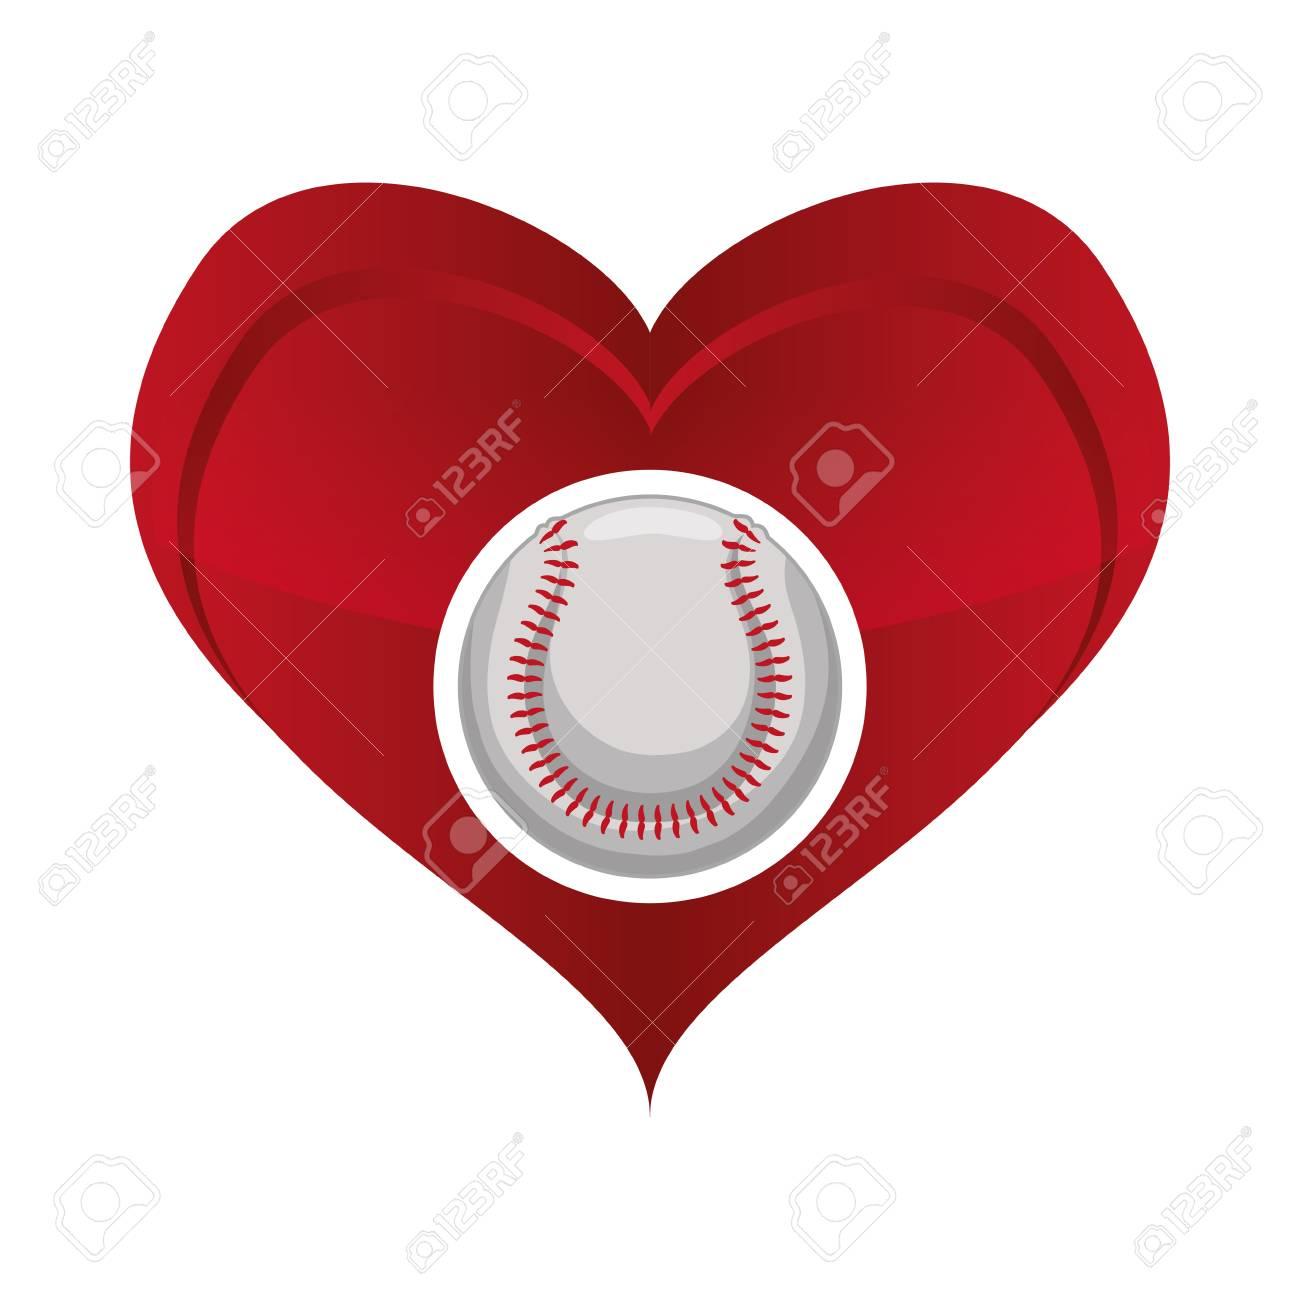 ball heart baseball sport competition game hobby icon flat and rh 123rf com Baseball Bat Vector Silhouette Baseball Bat Vector Silhouette